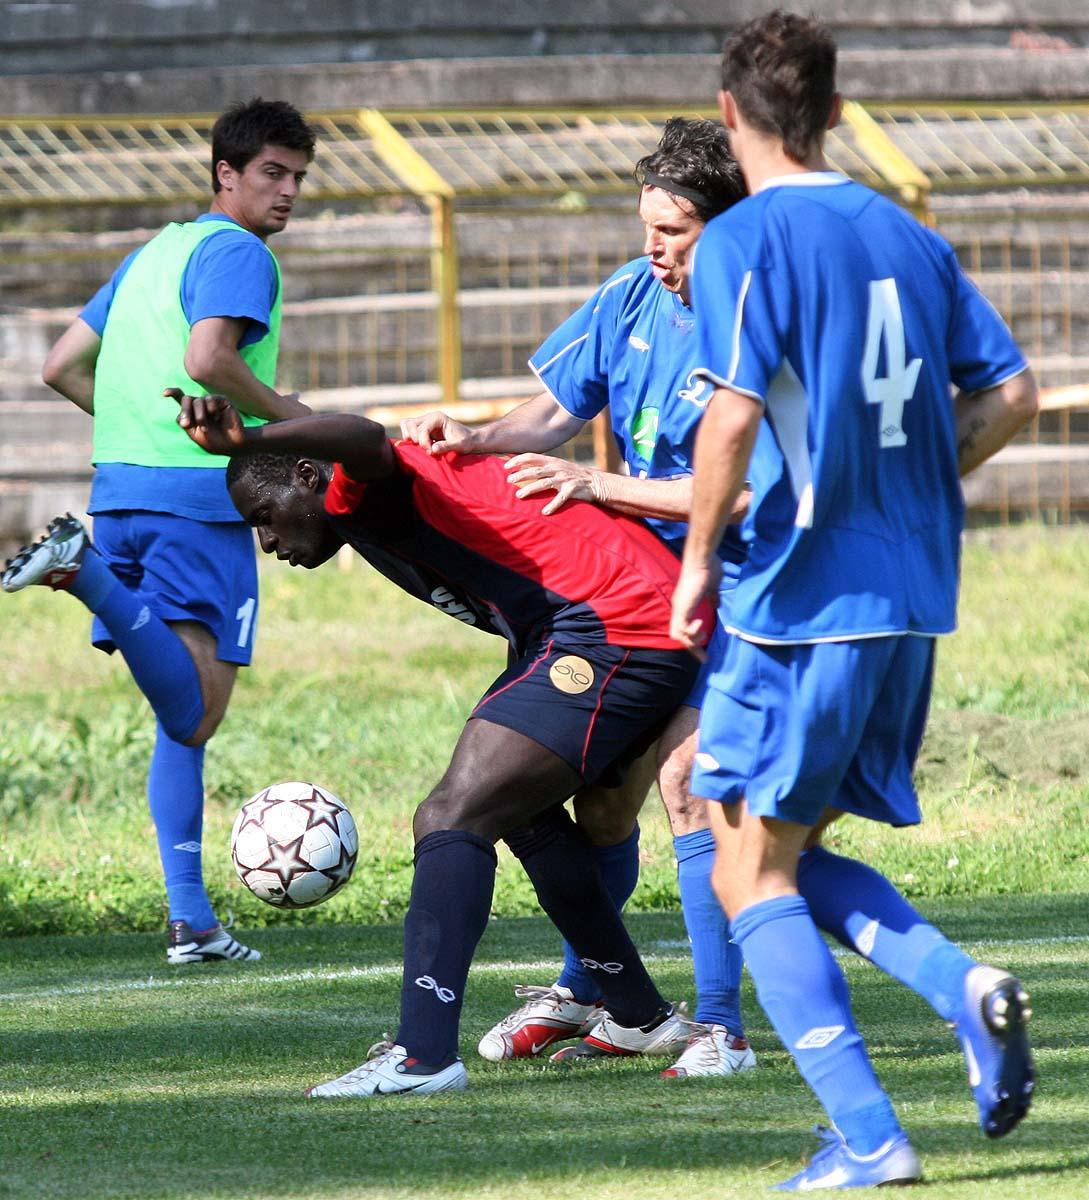 Java e 28: Dinamo - Vllaznia 1-2